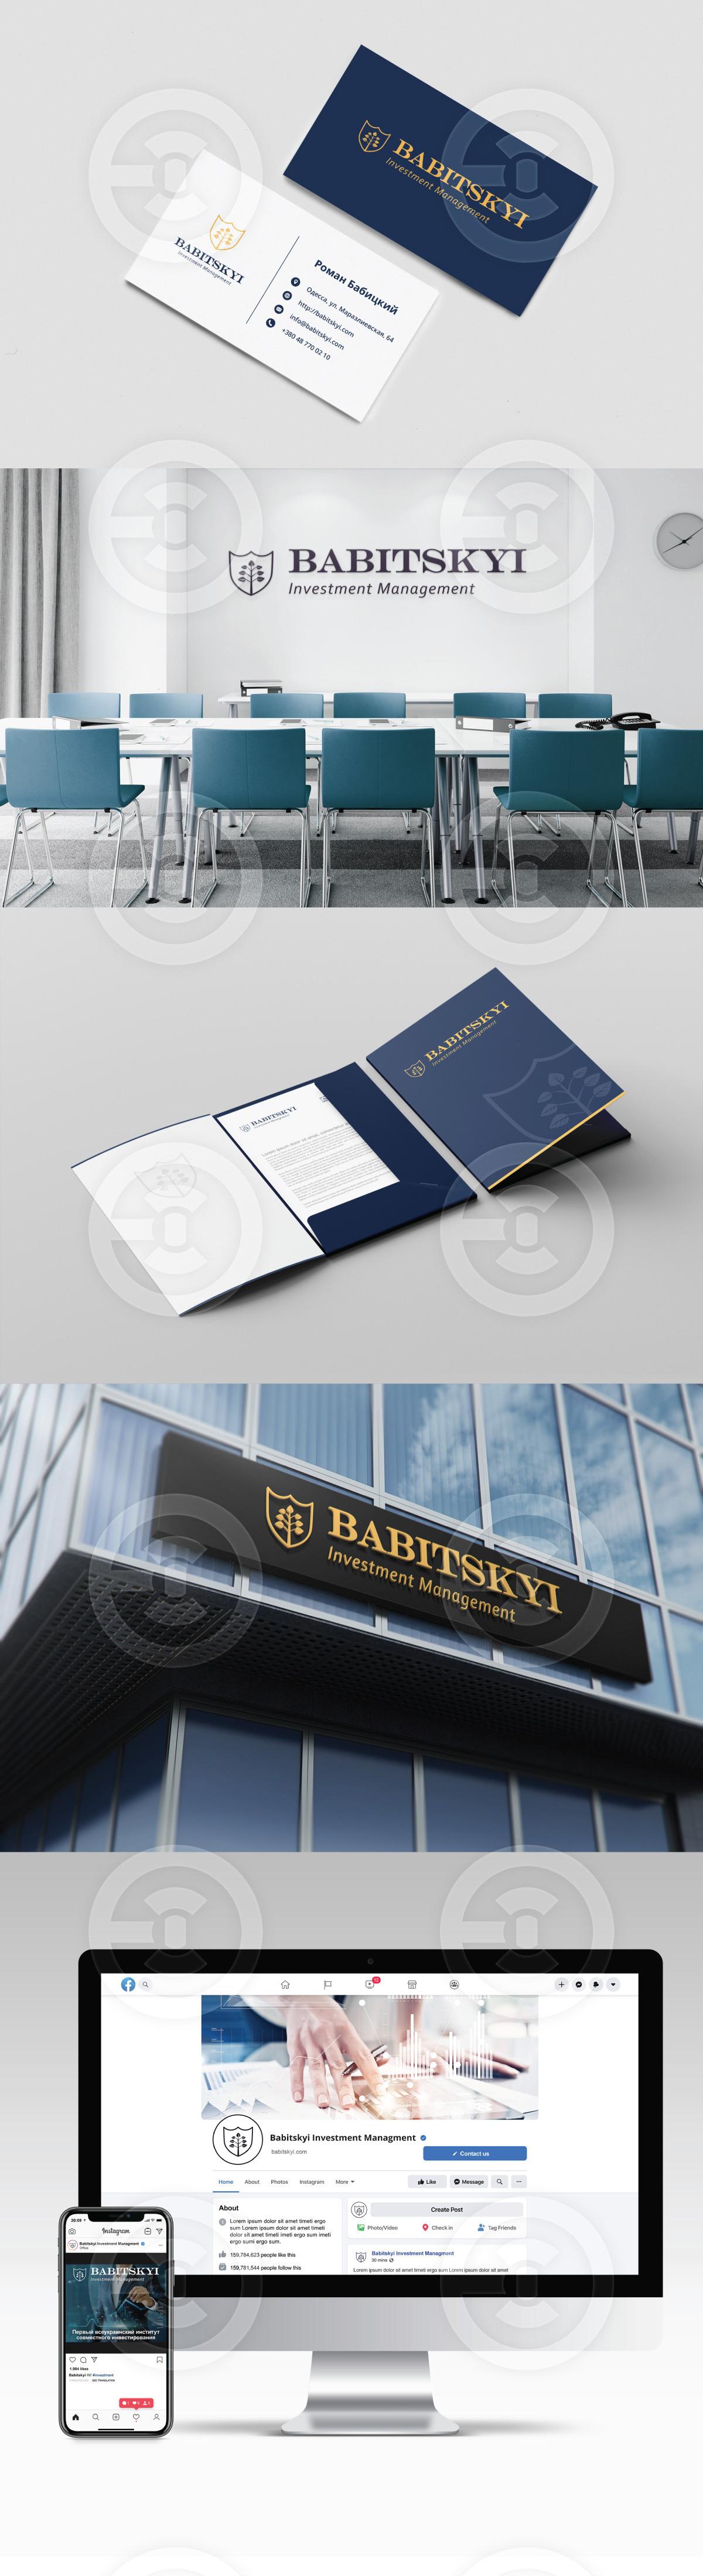 Babitskyi Investment Managment.jpg